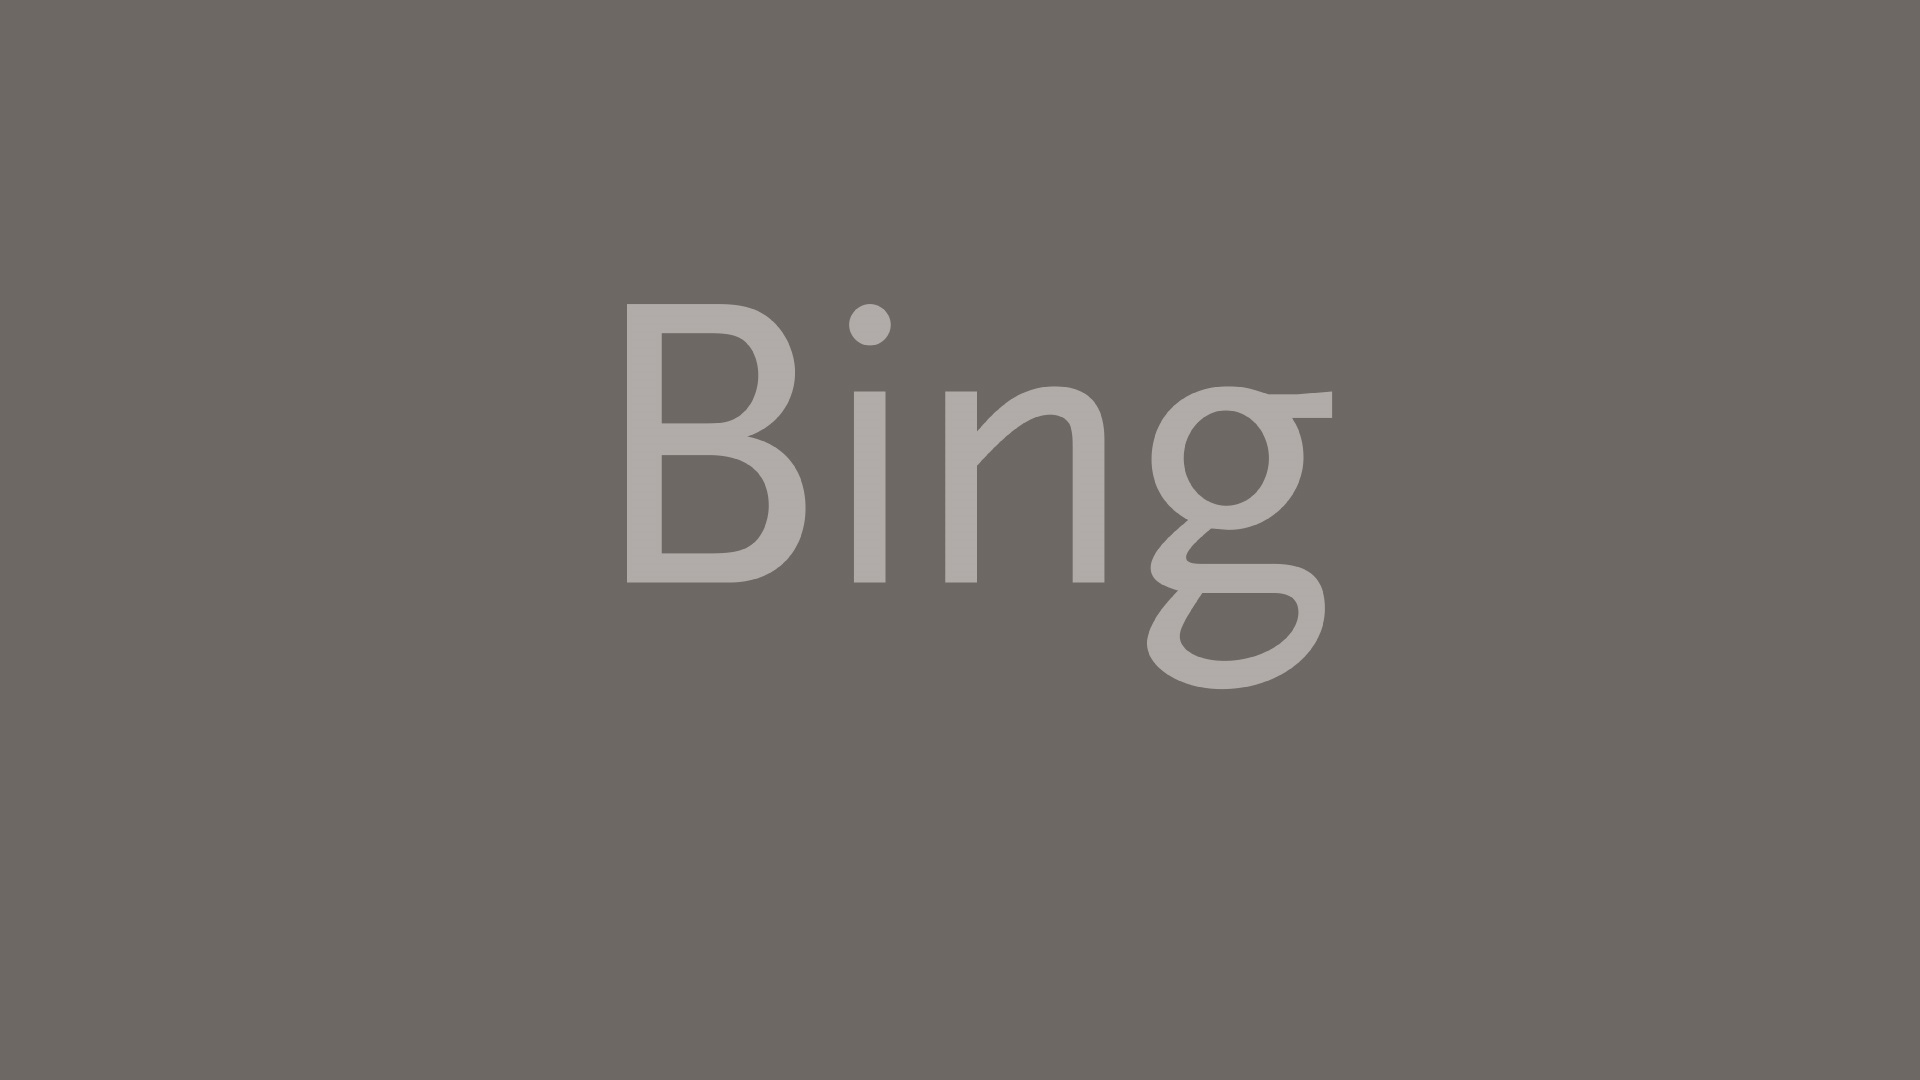 Inspirational Sports Quotes Wallpaper For Iphone Bing Logo Wallpapers Pixelstalk Net